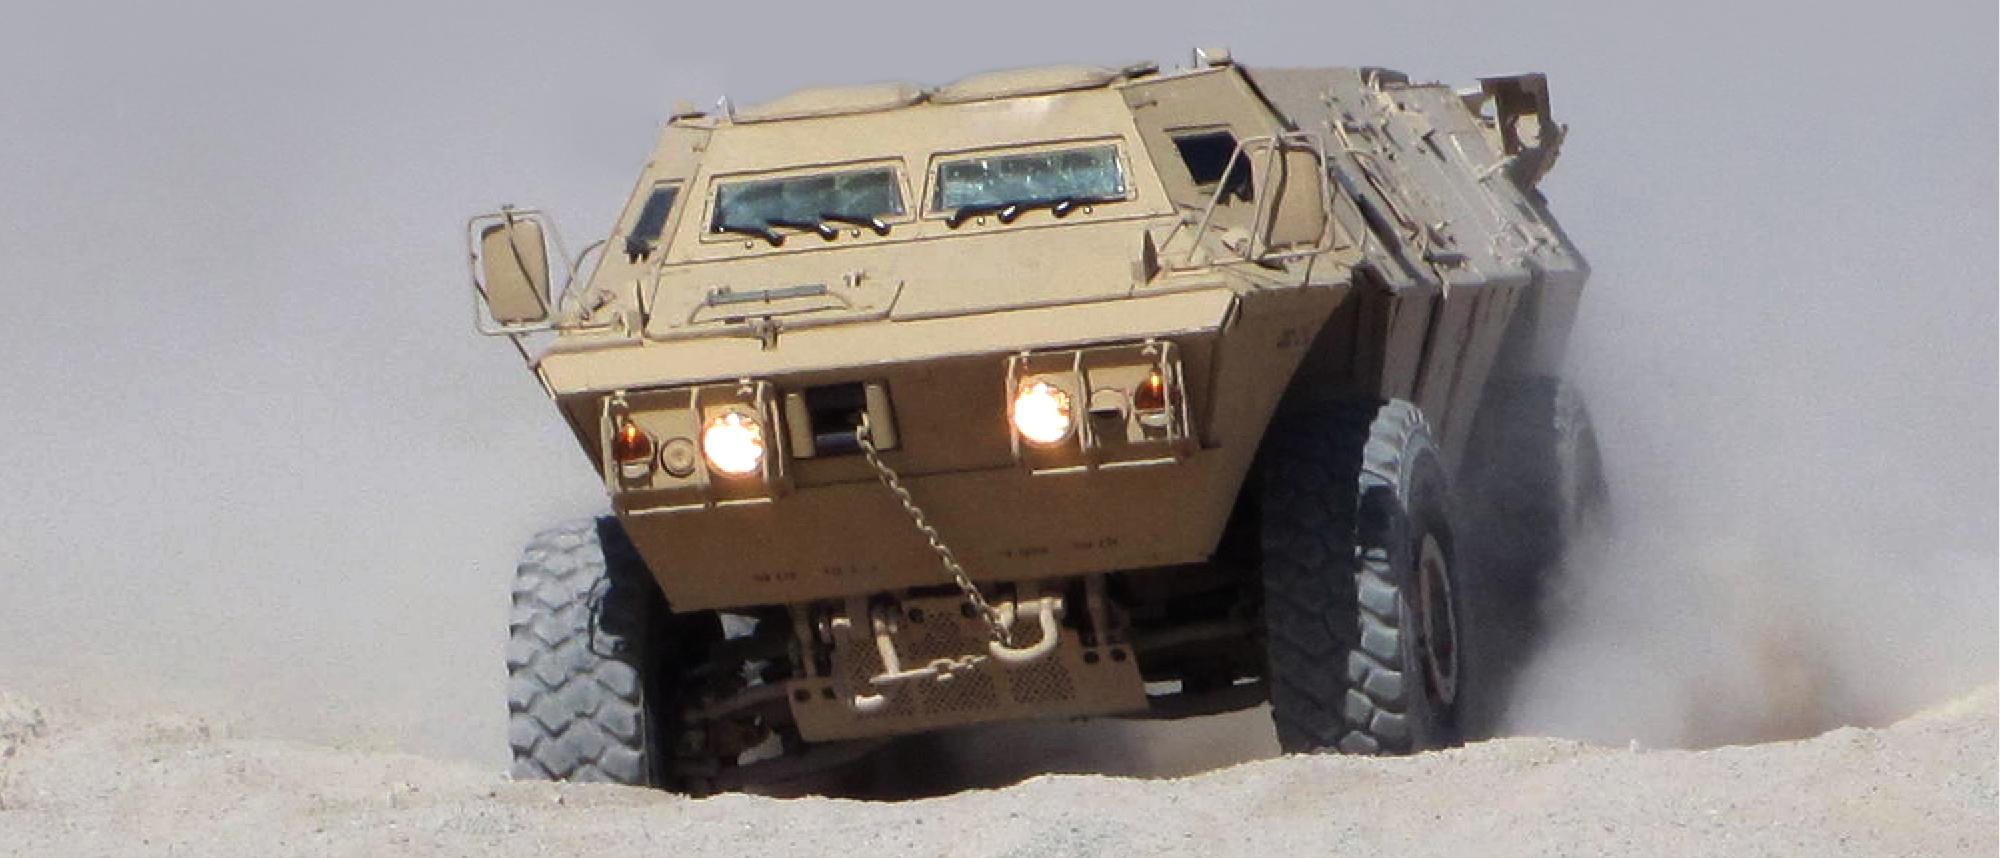 Commando Vanguard